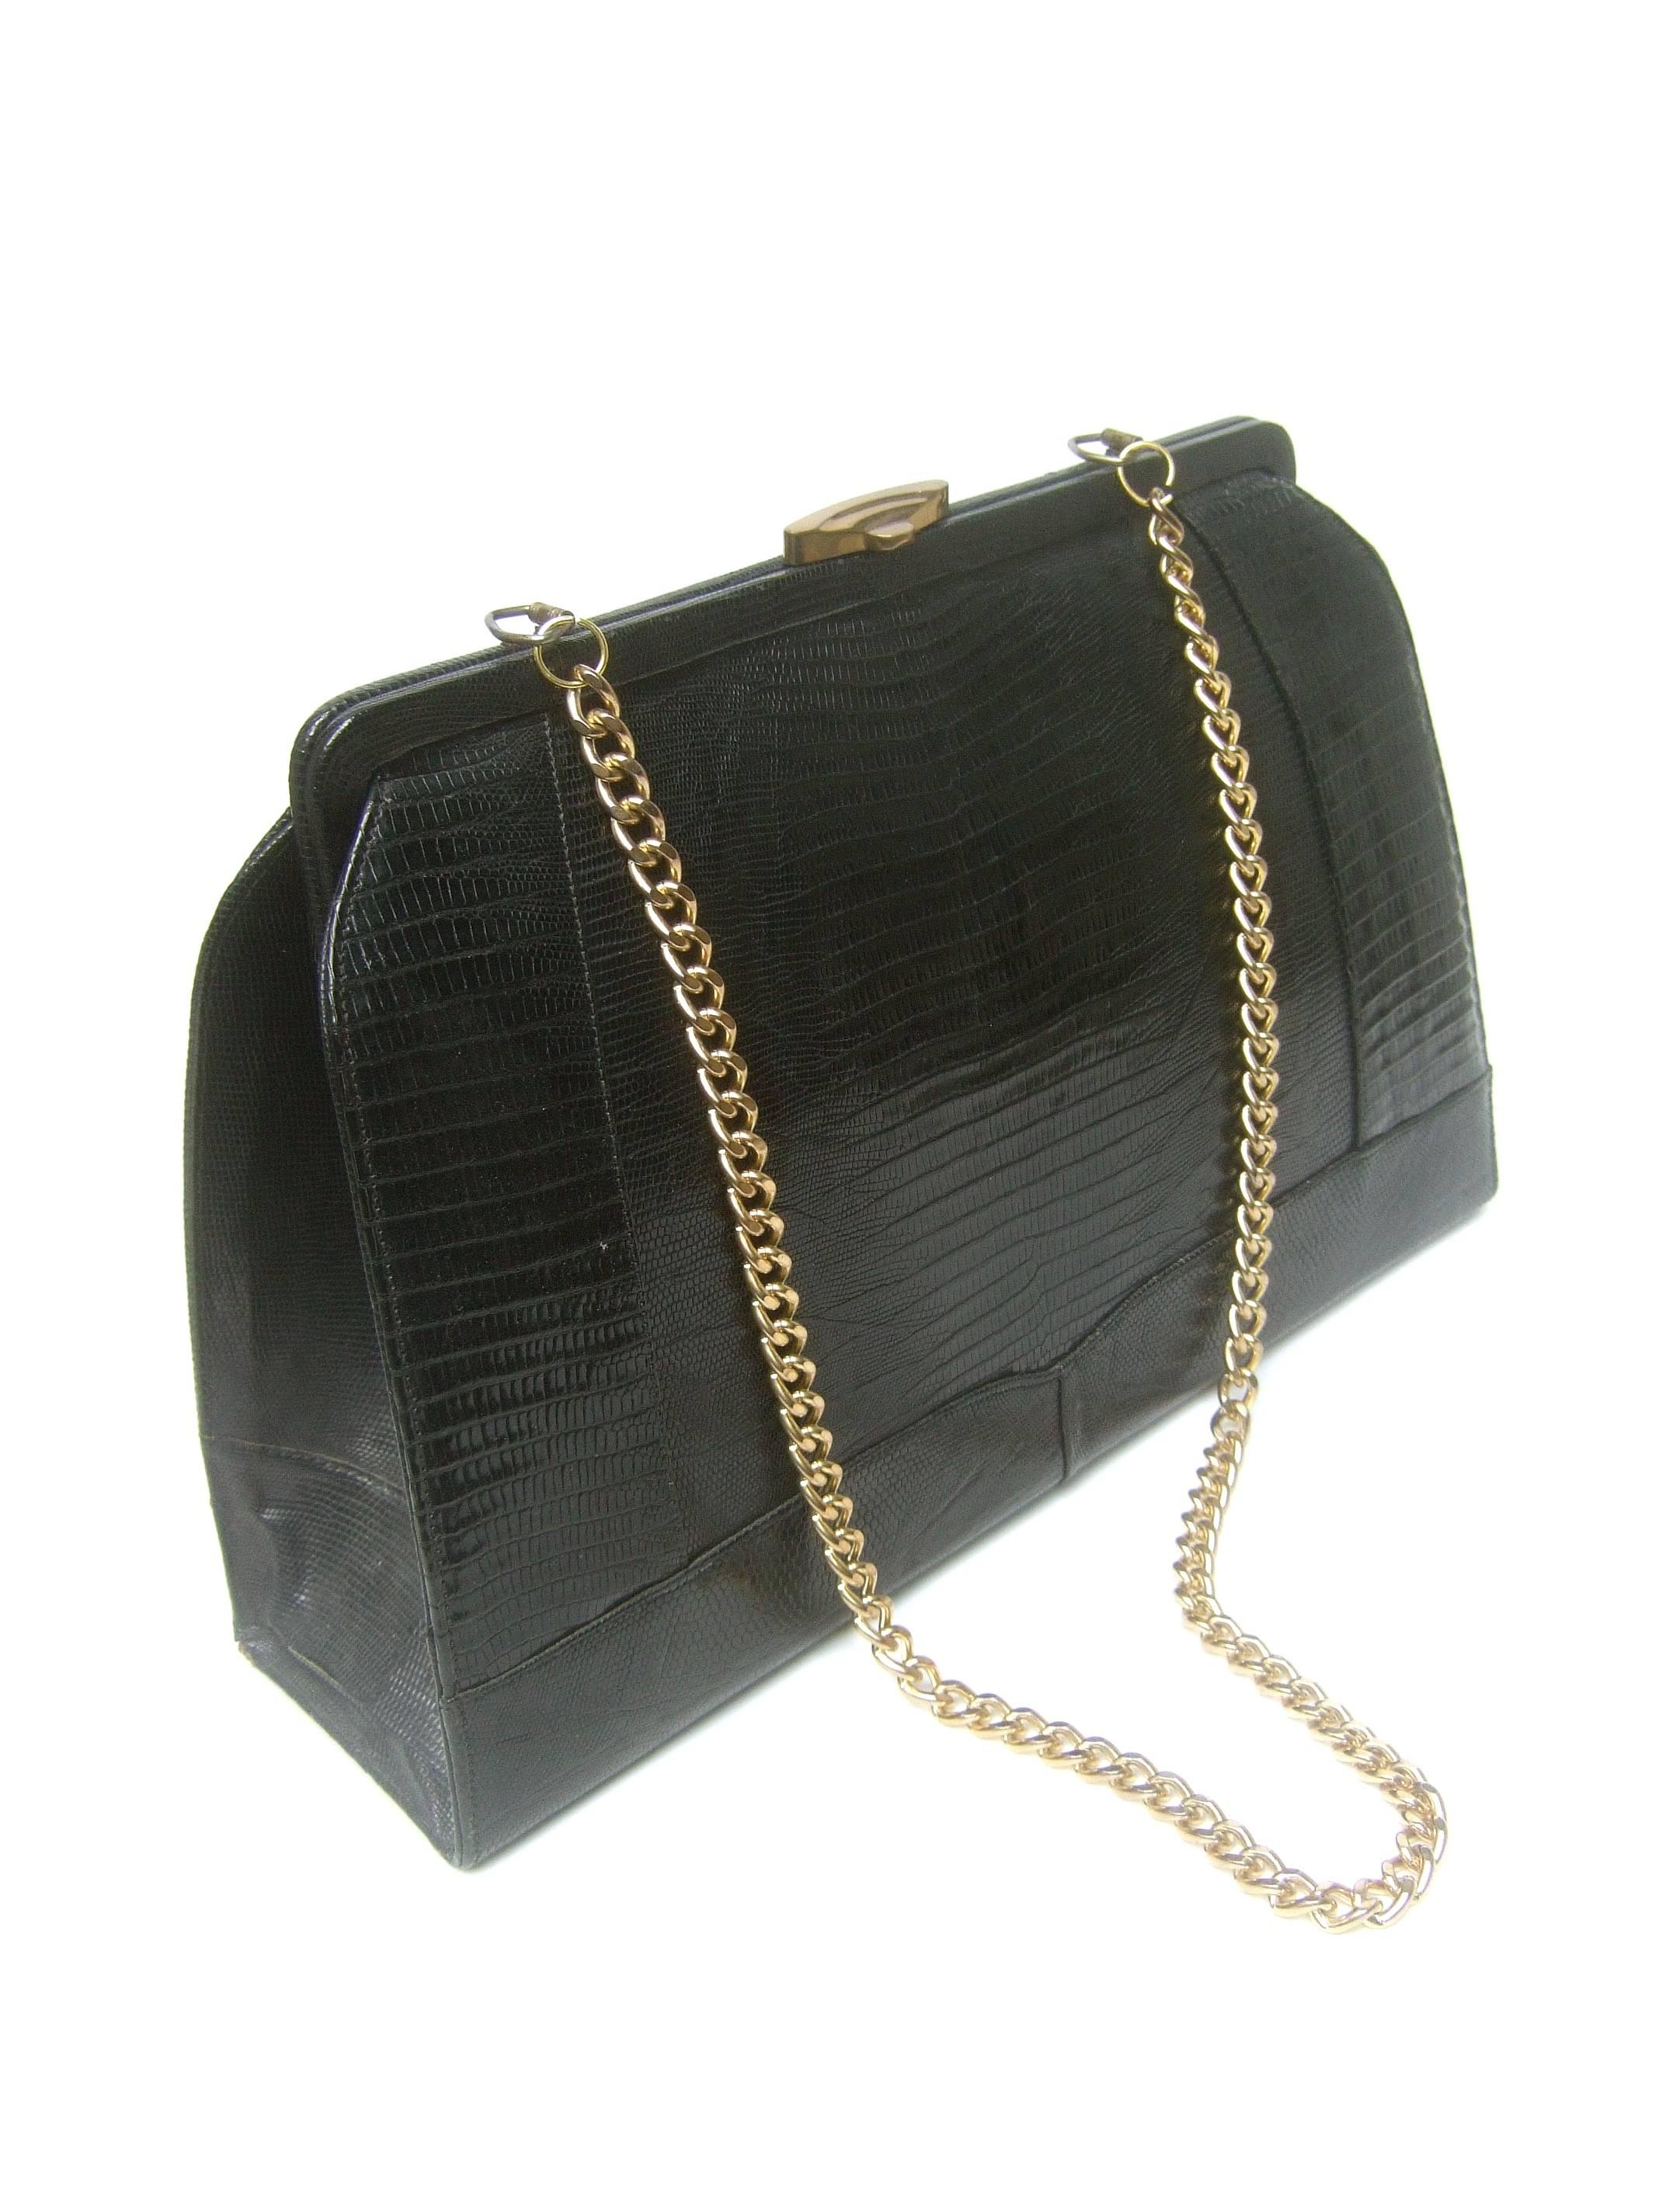 a73d0d1d41 Sleek Ebony Lizard Skin Structured Handbag c 1960 For Sale at 1stdibs